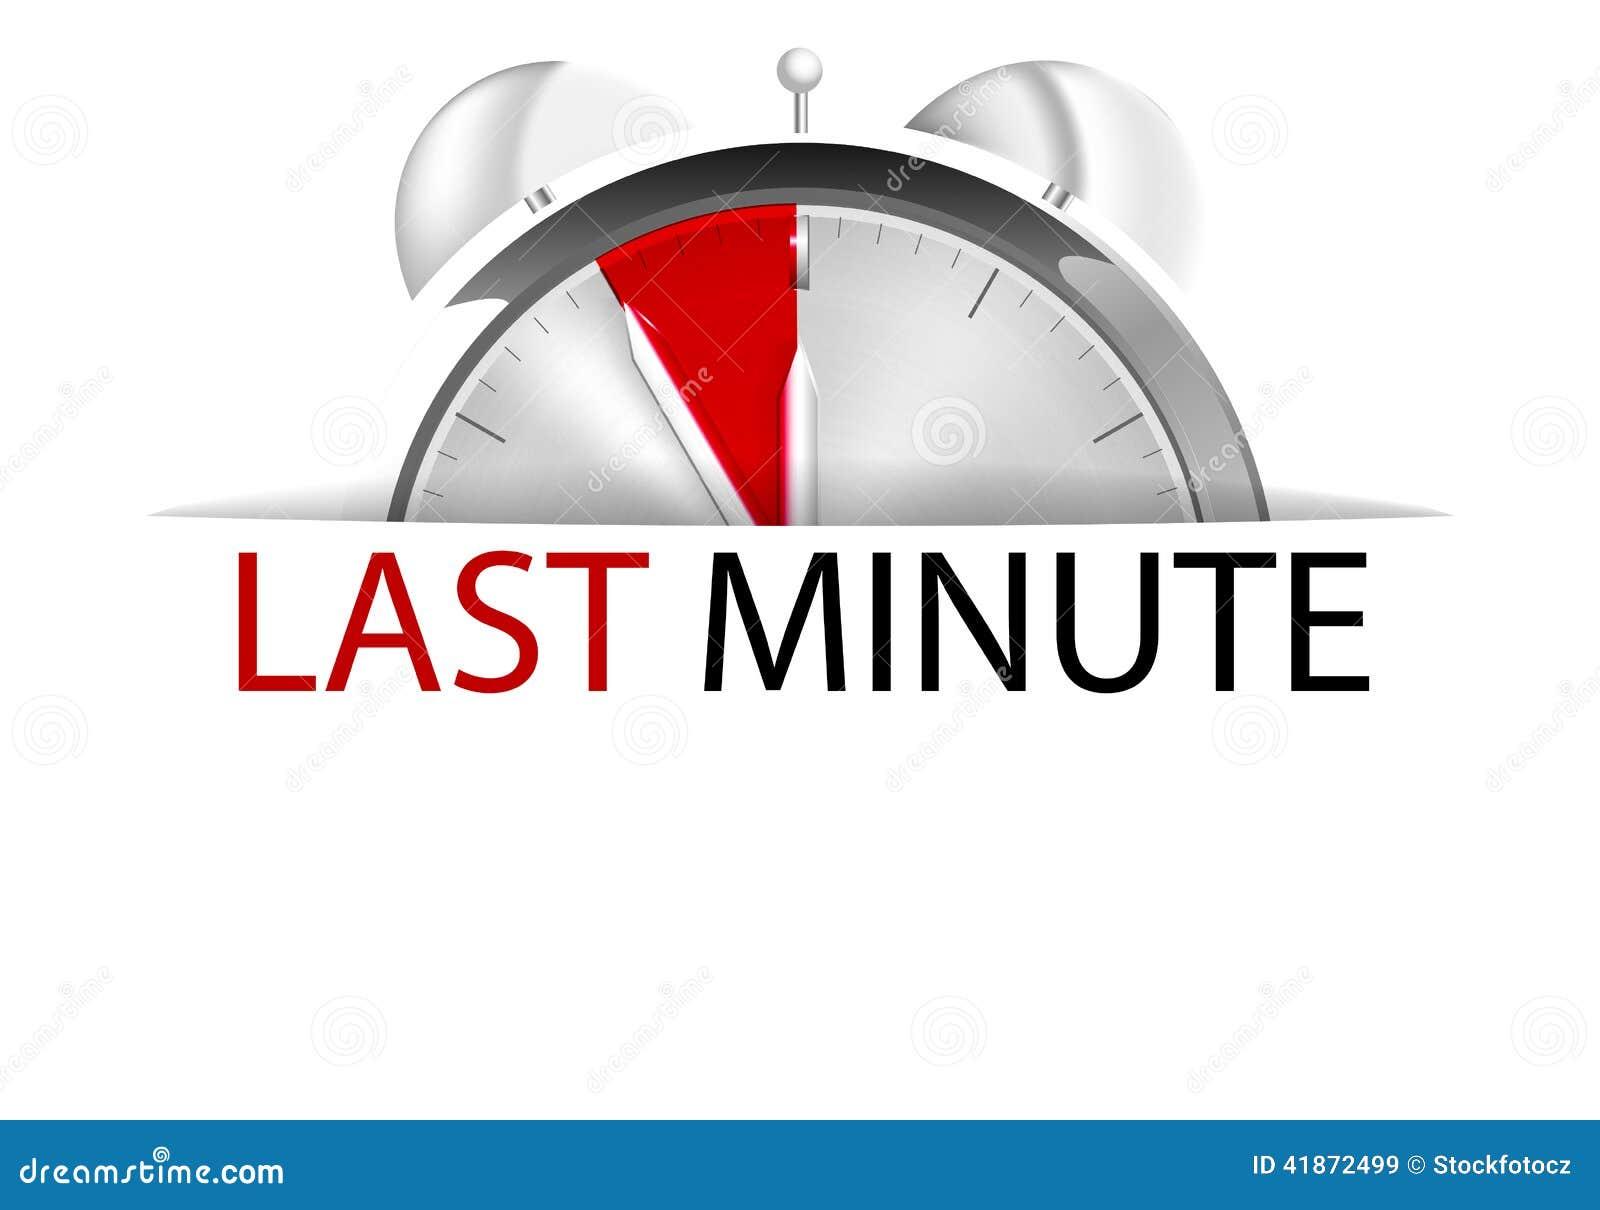 Последняя минута